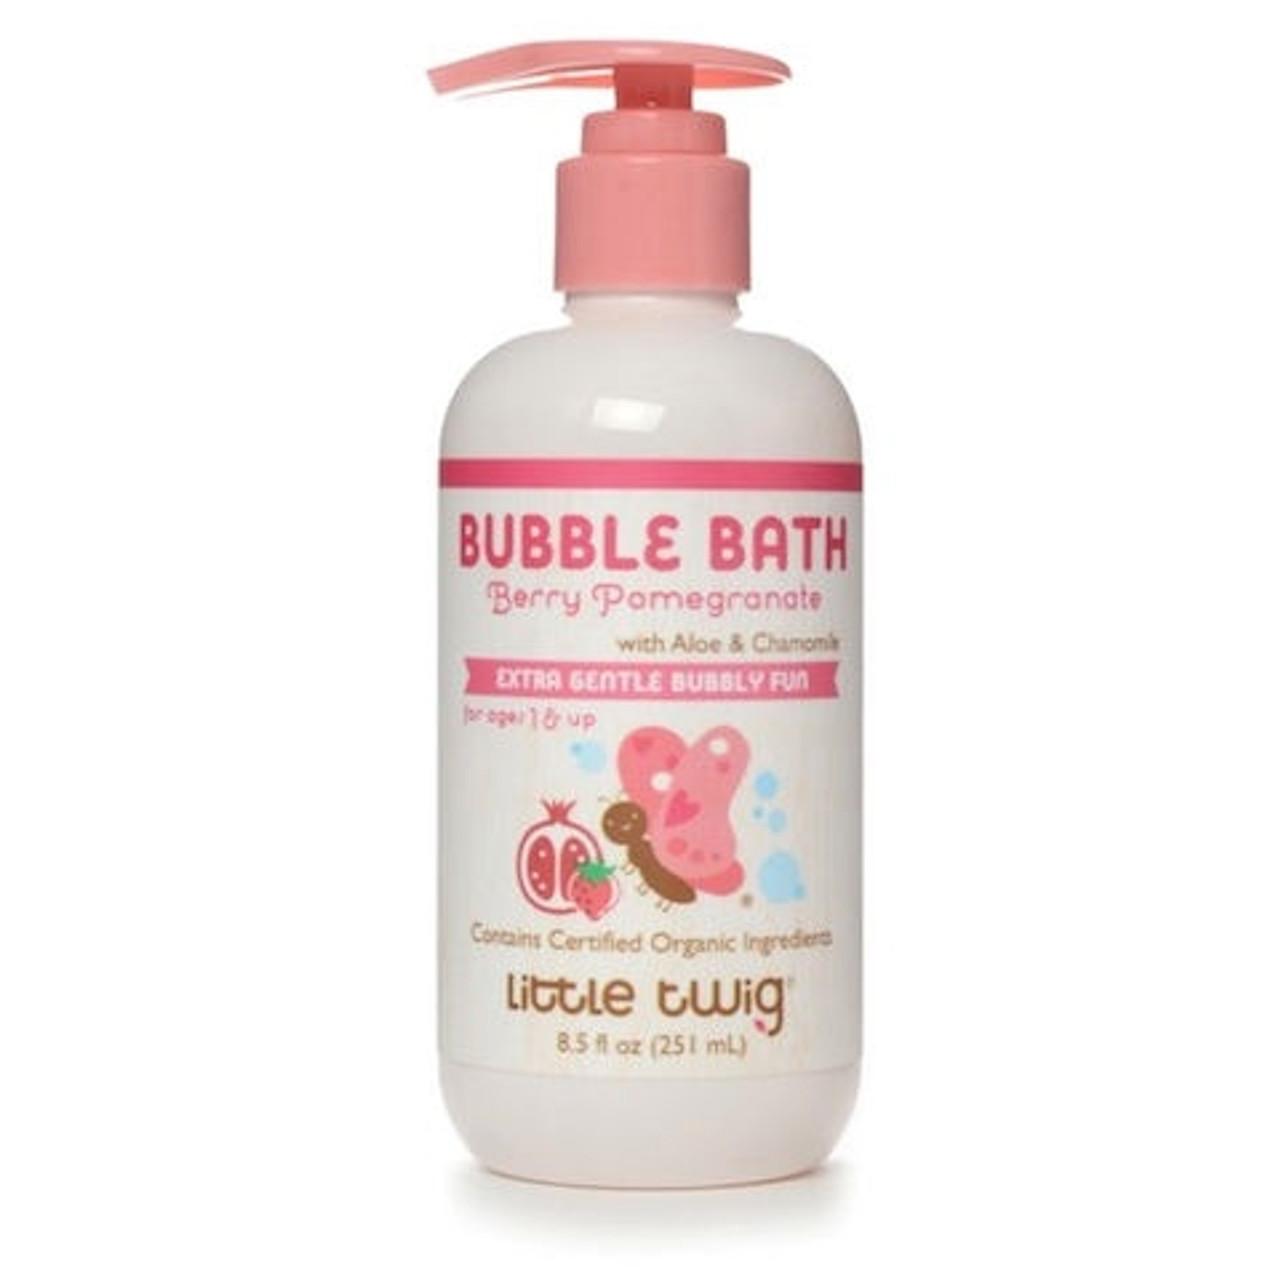 Little Twig Organic Bubble Bath - Berry Pomegranate, 8.5oz